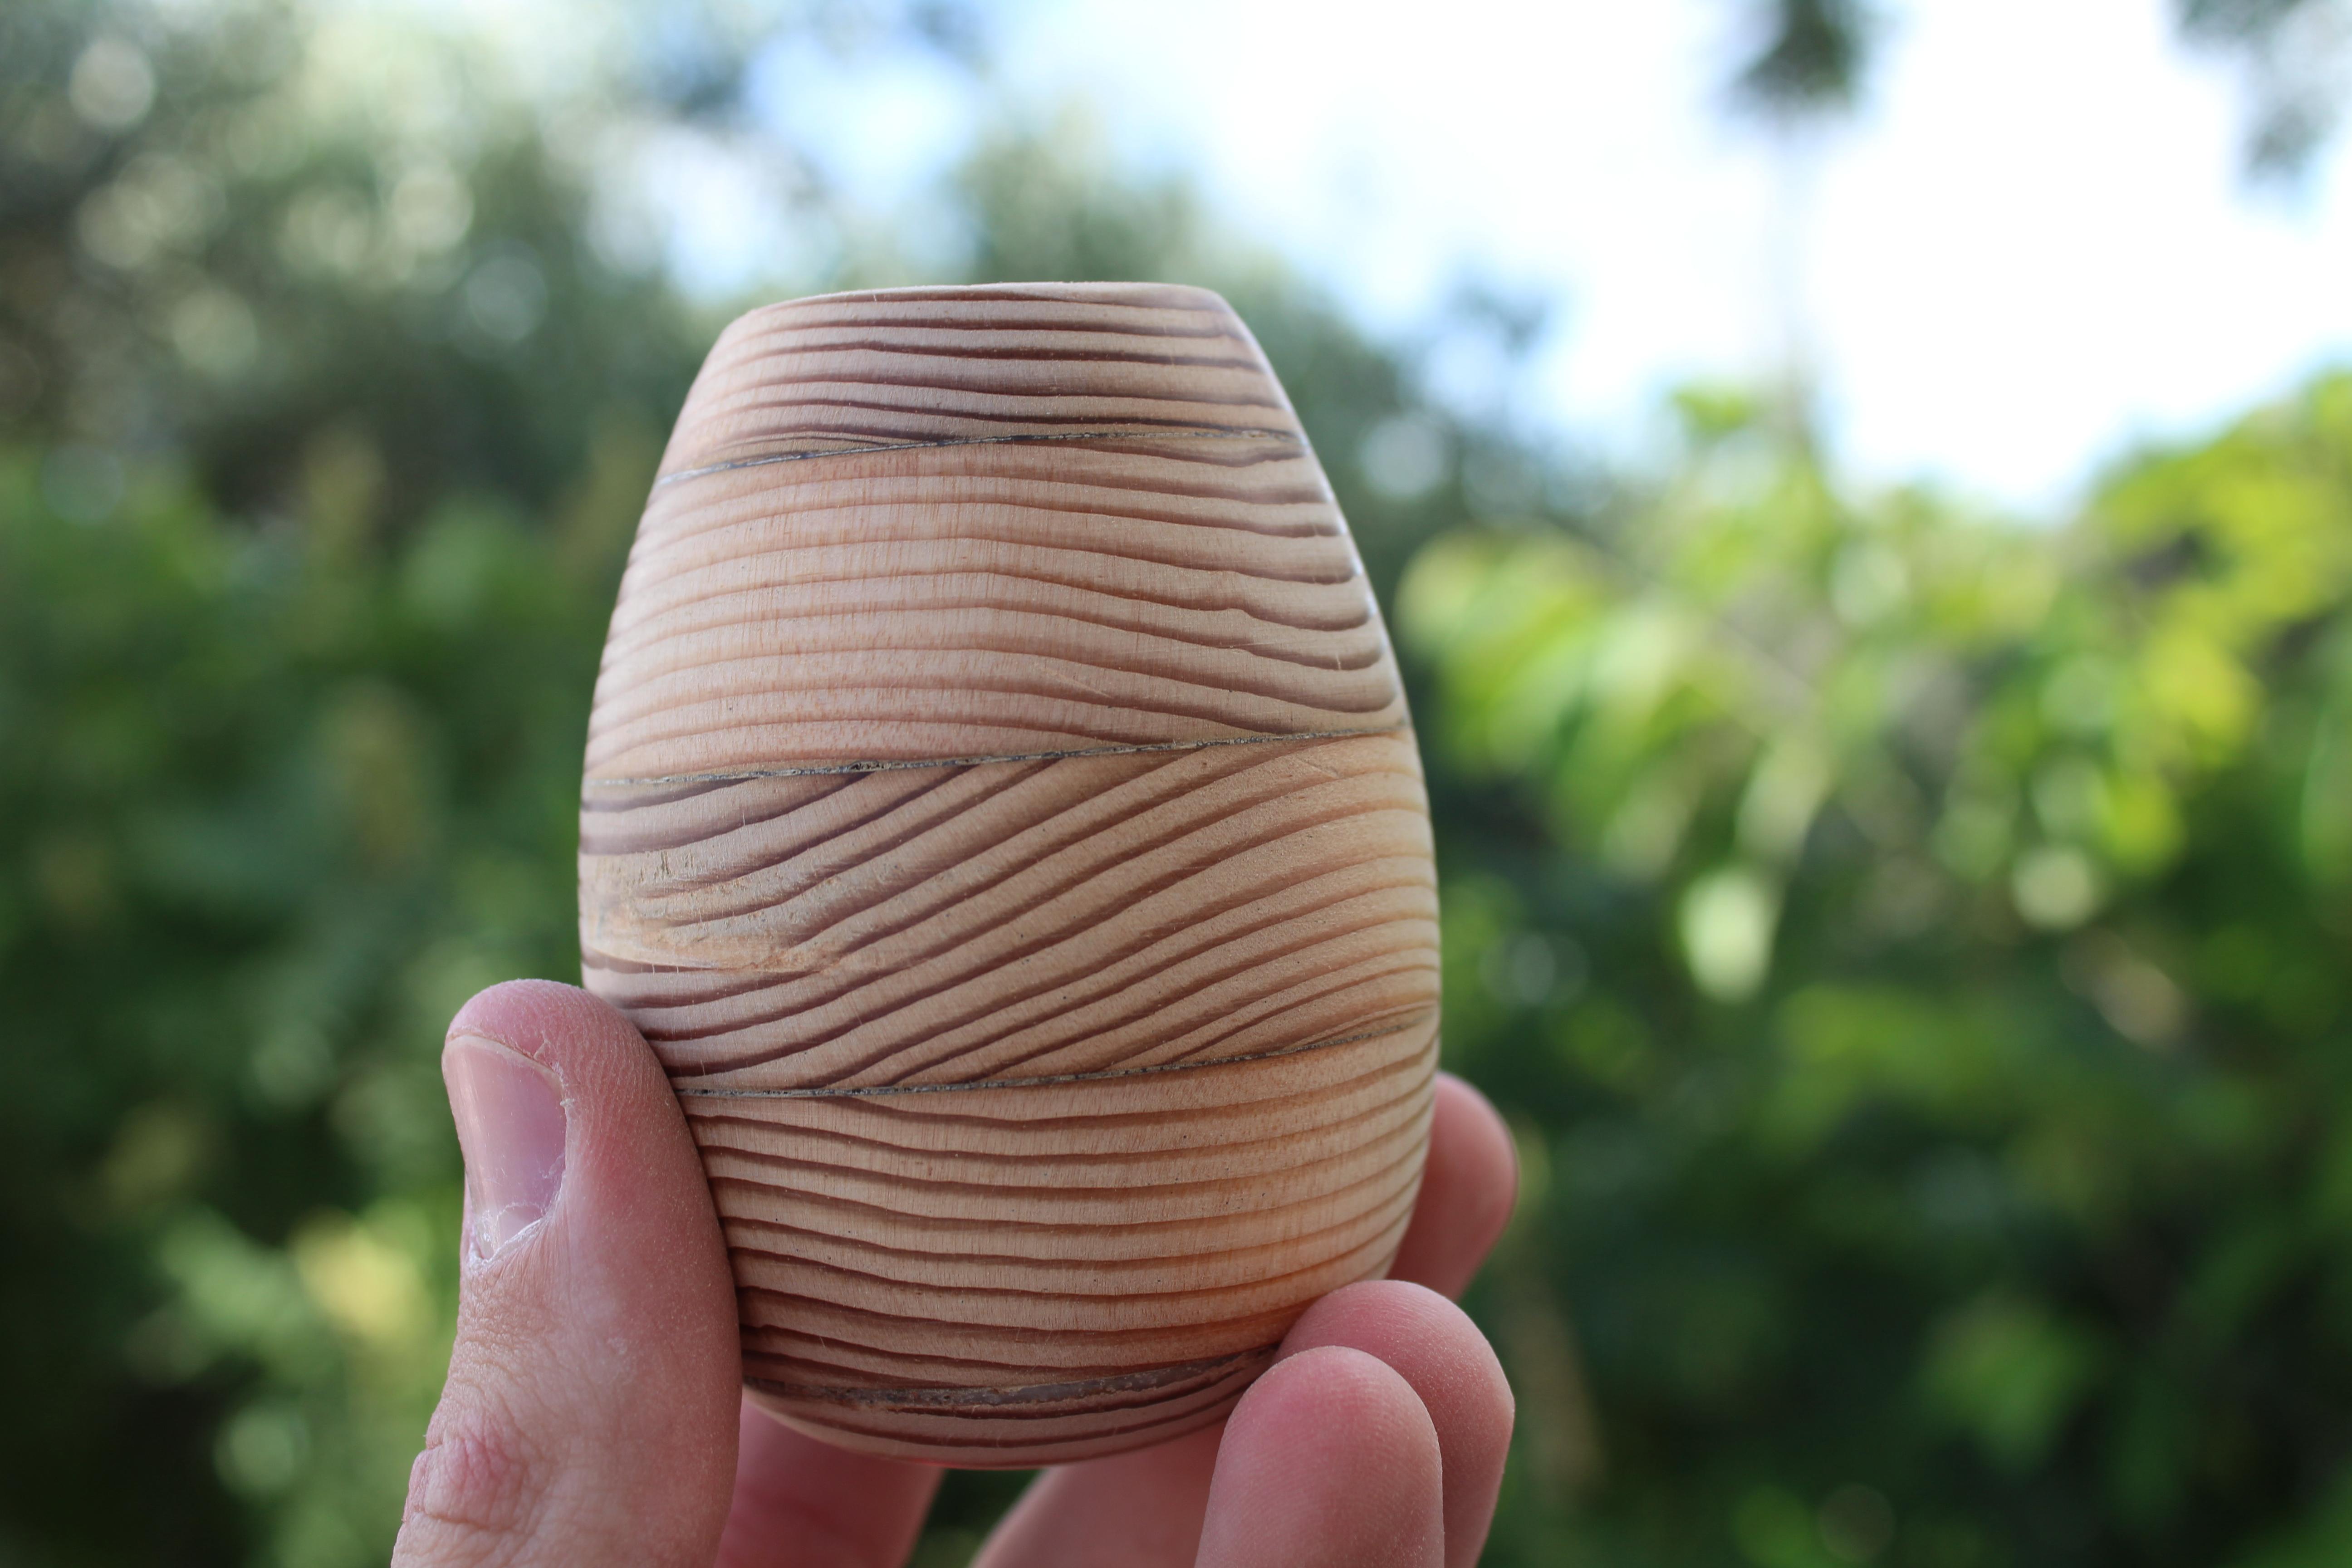 Picture of Decorative Egg